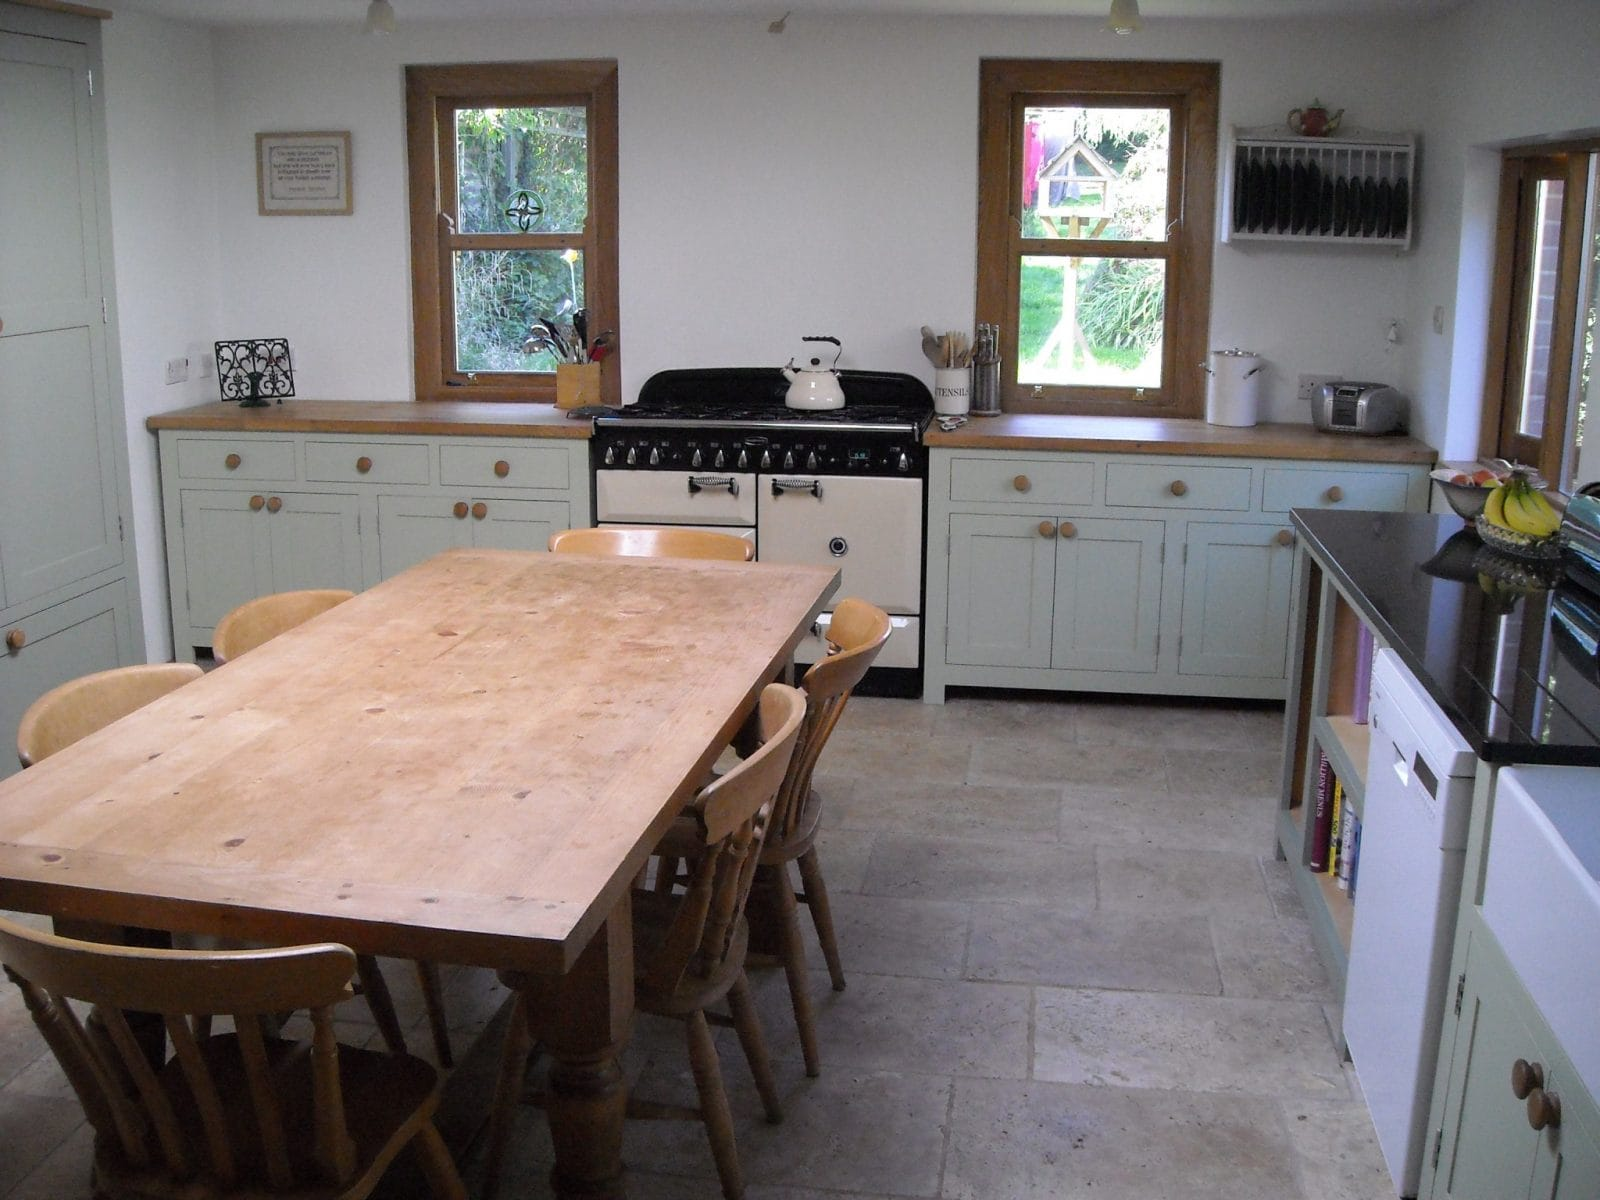 free standing kitchens american standard kitchen faucets parts curdridge higham furniture freestanding